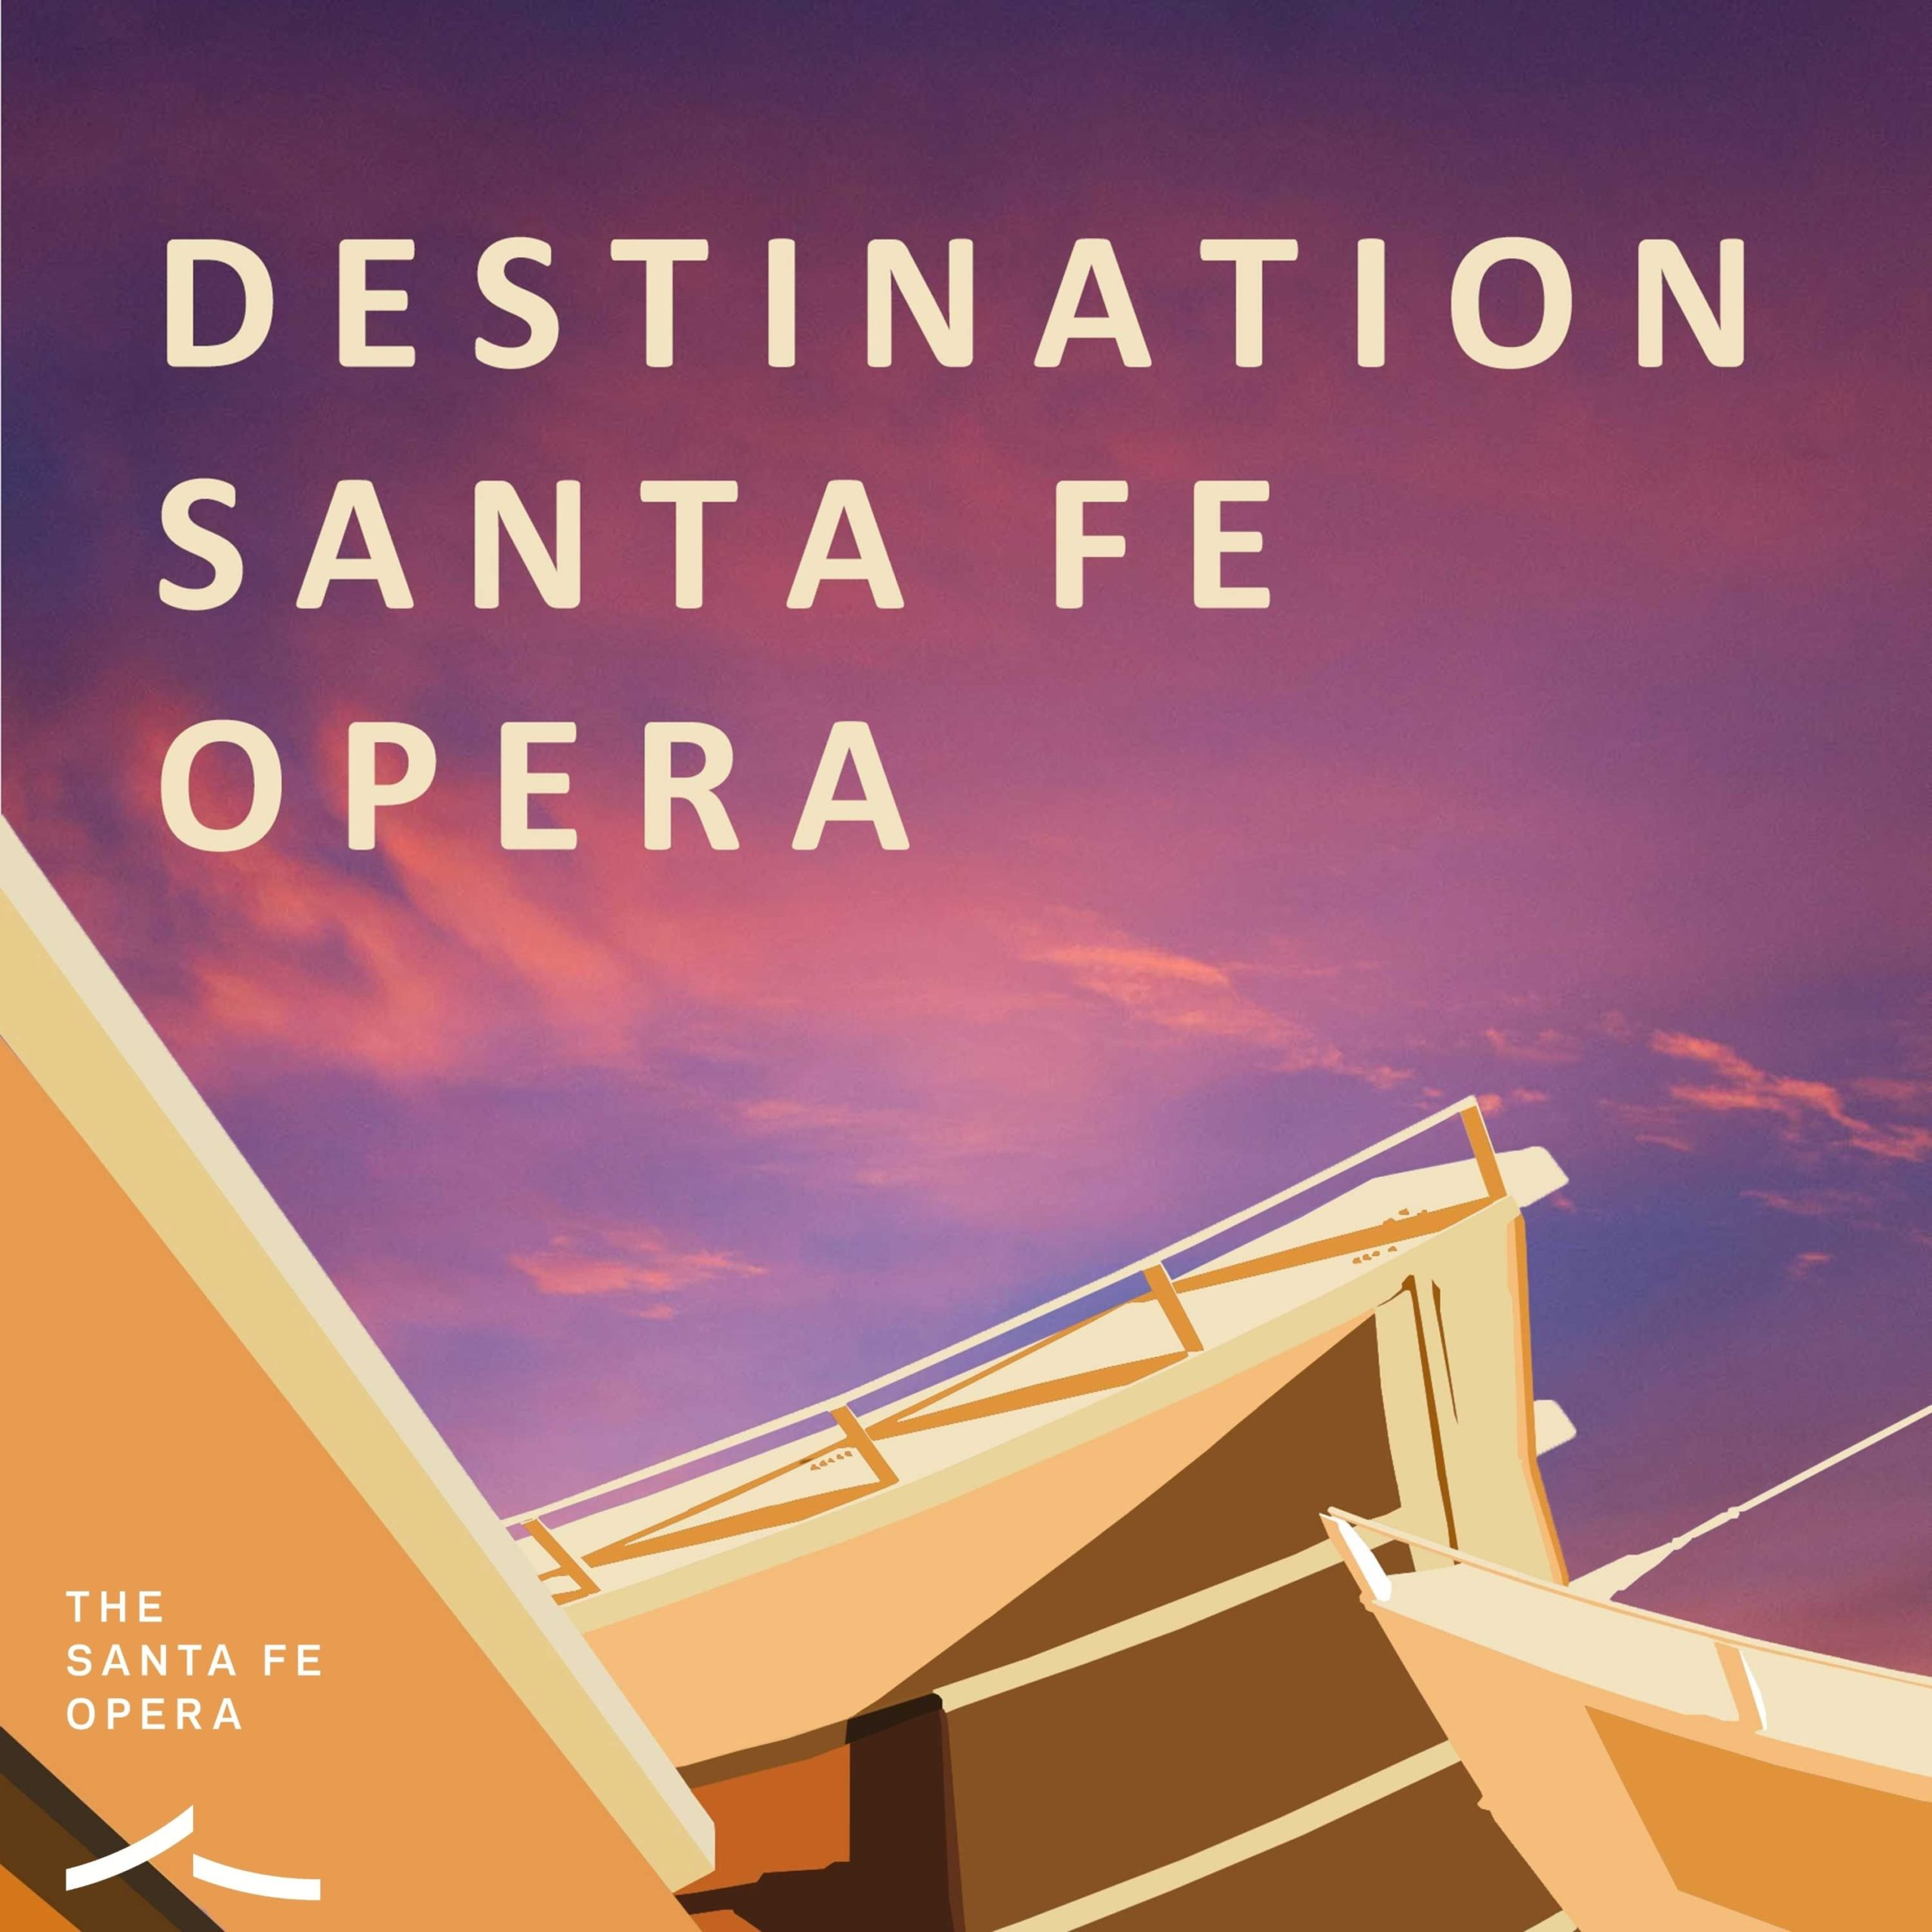 Destination Santa Fe Opera